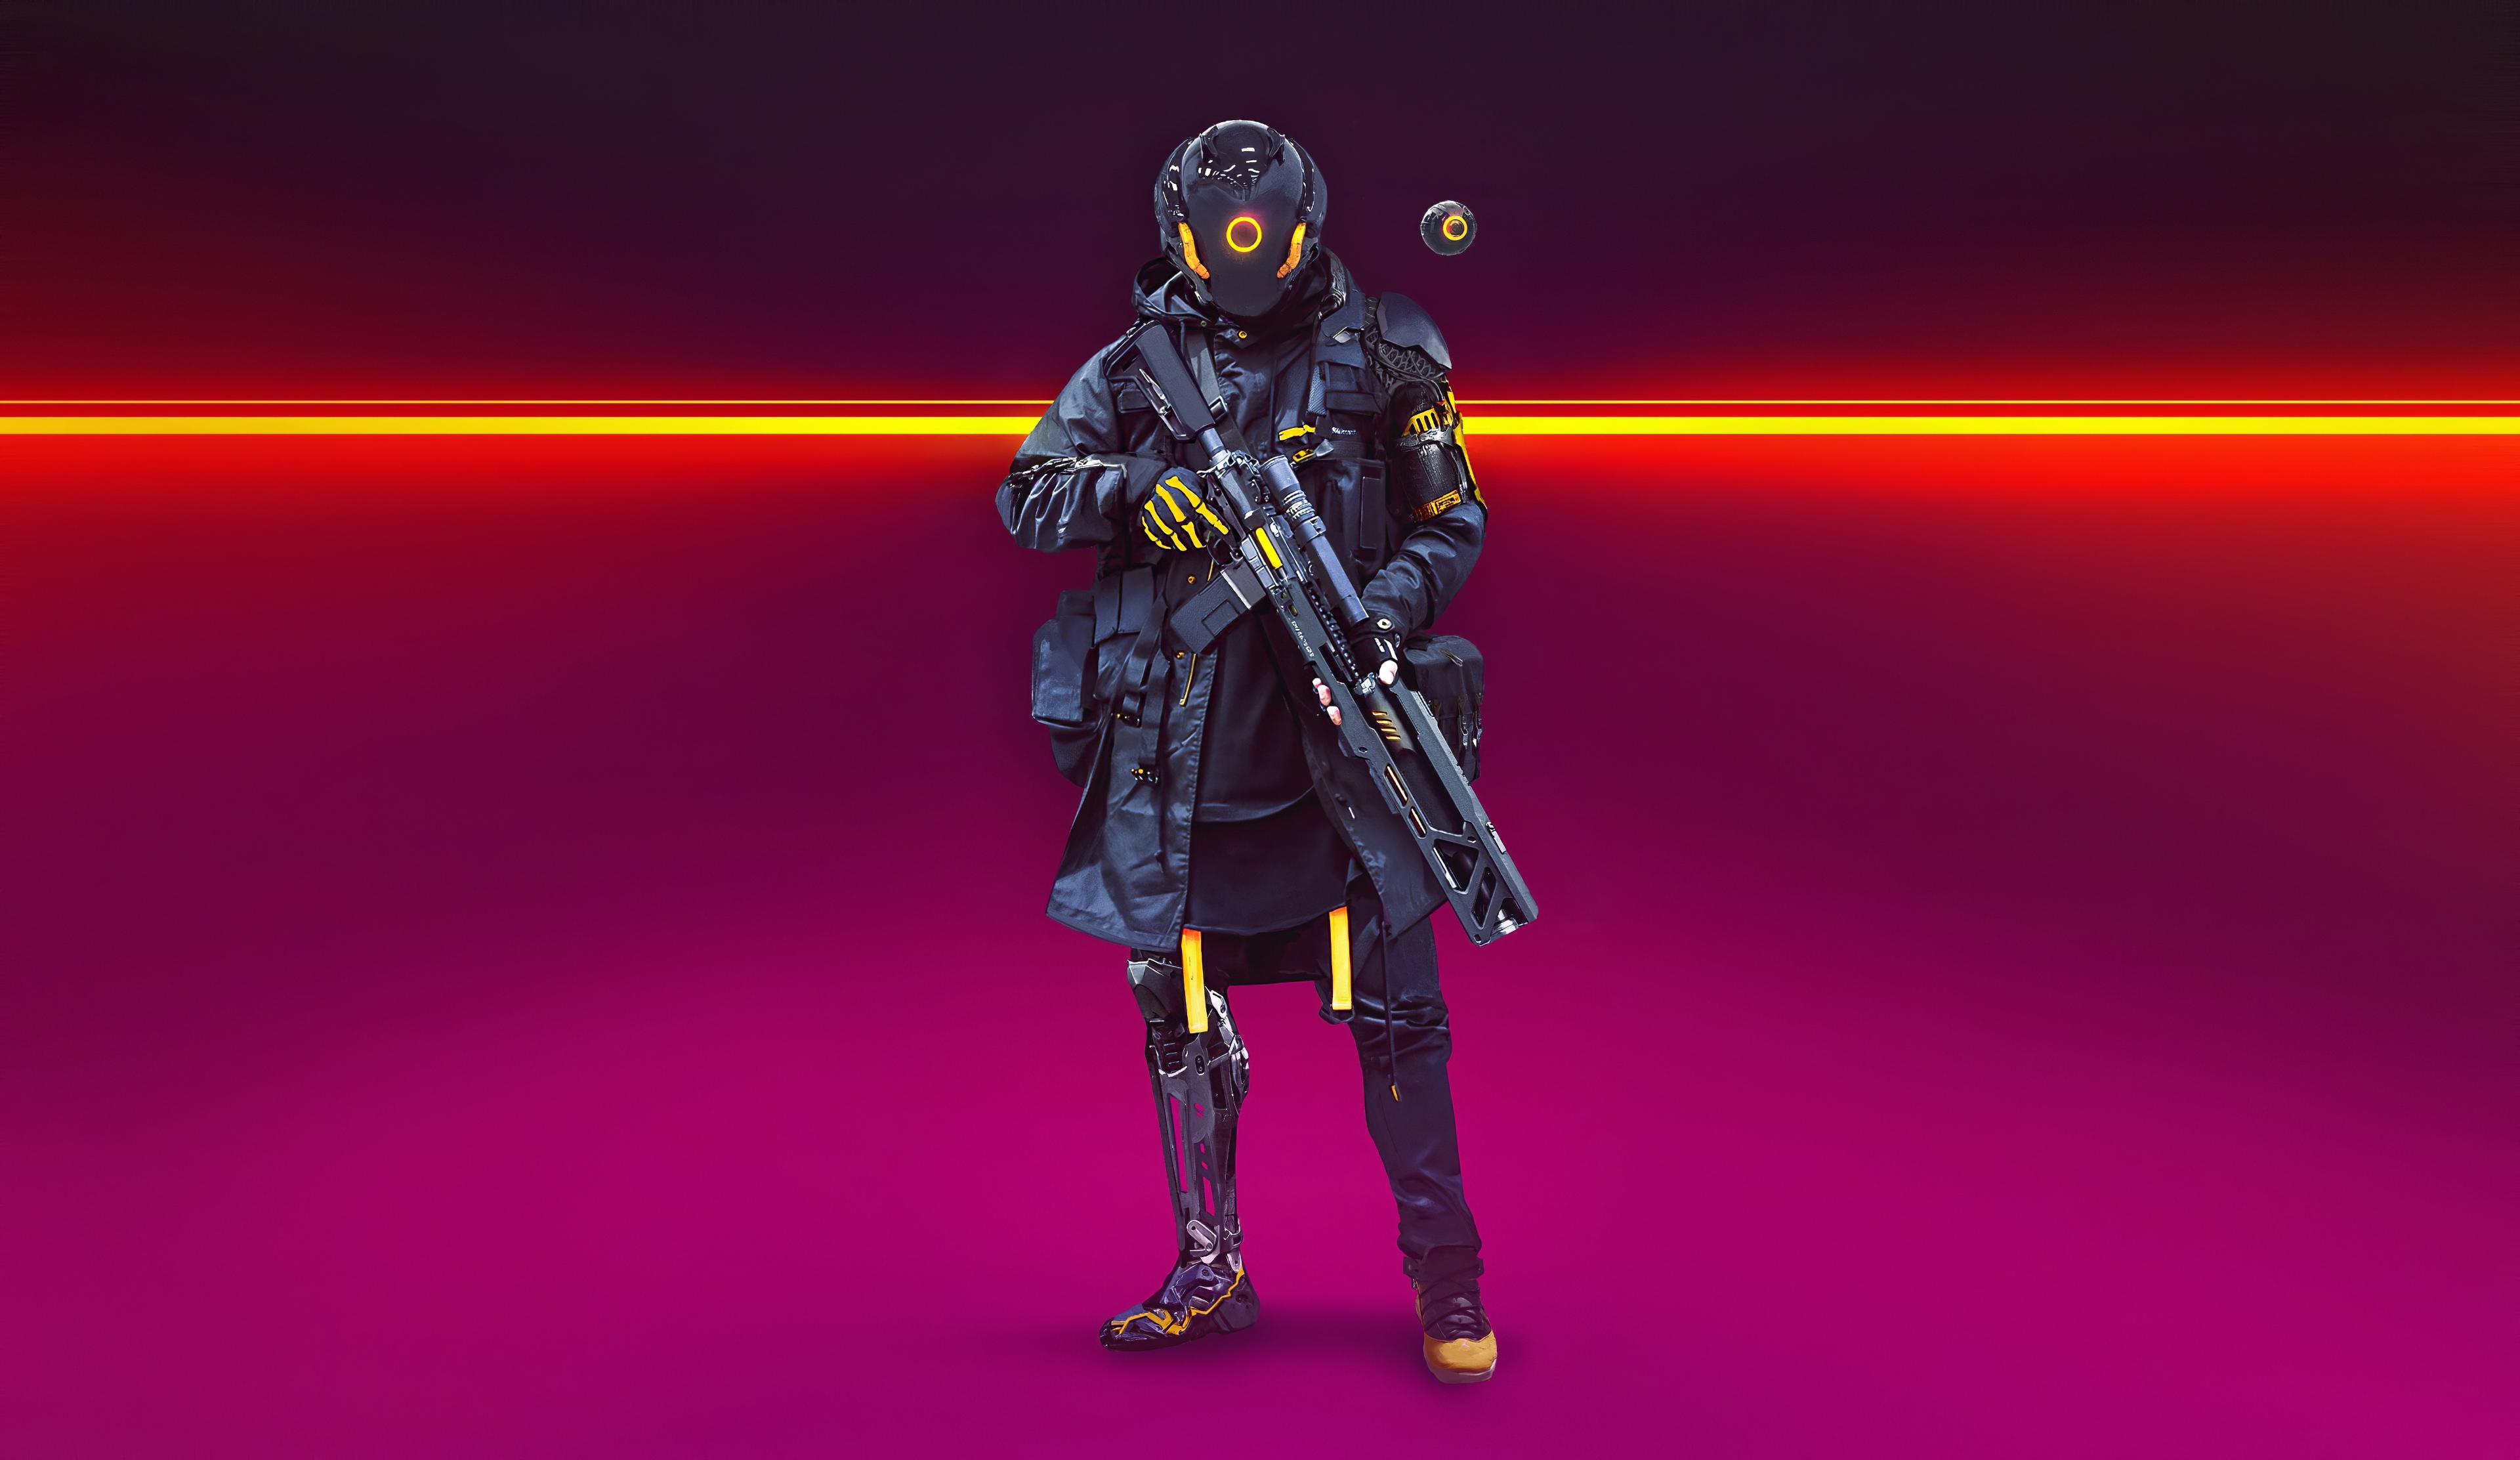 cyberpunk soldier turbo police 1578255468 - Cyberpunk Soldier Turbo Police -